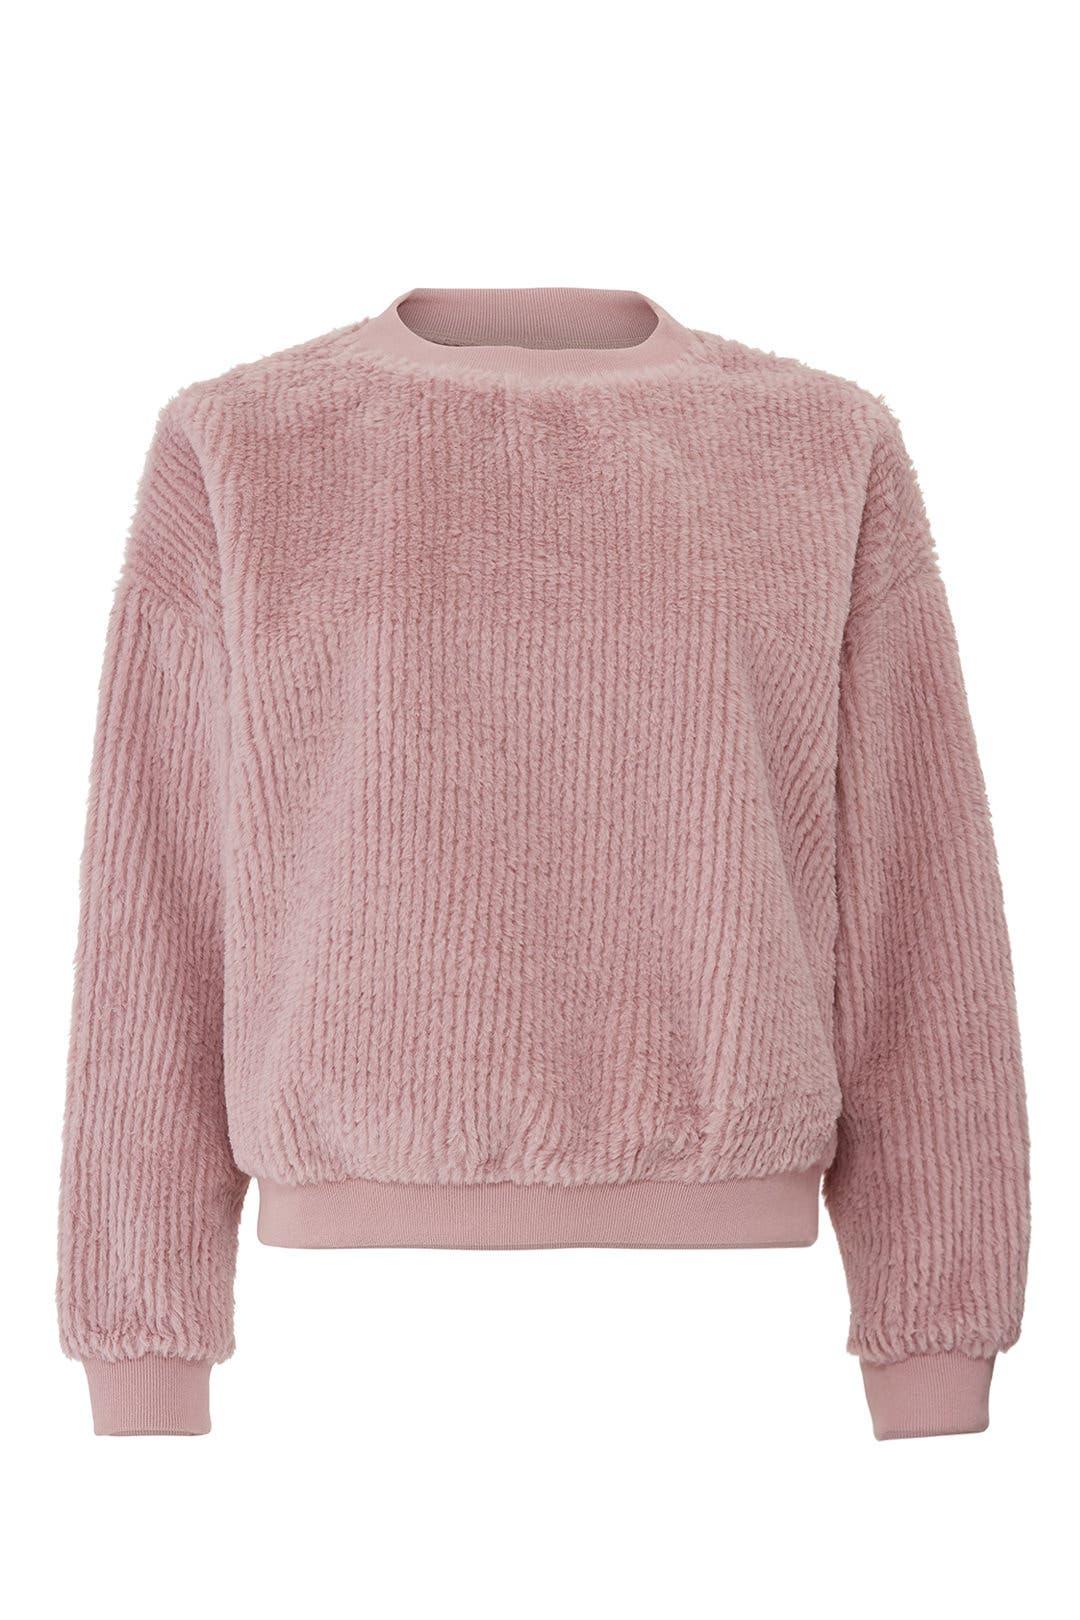 e8ee329ed04d Moon River. Read Reviews. Dusty Rose Faux Fur Sweatshirt